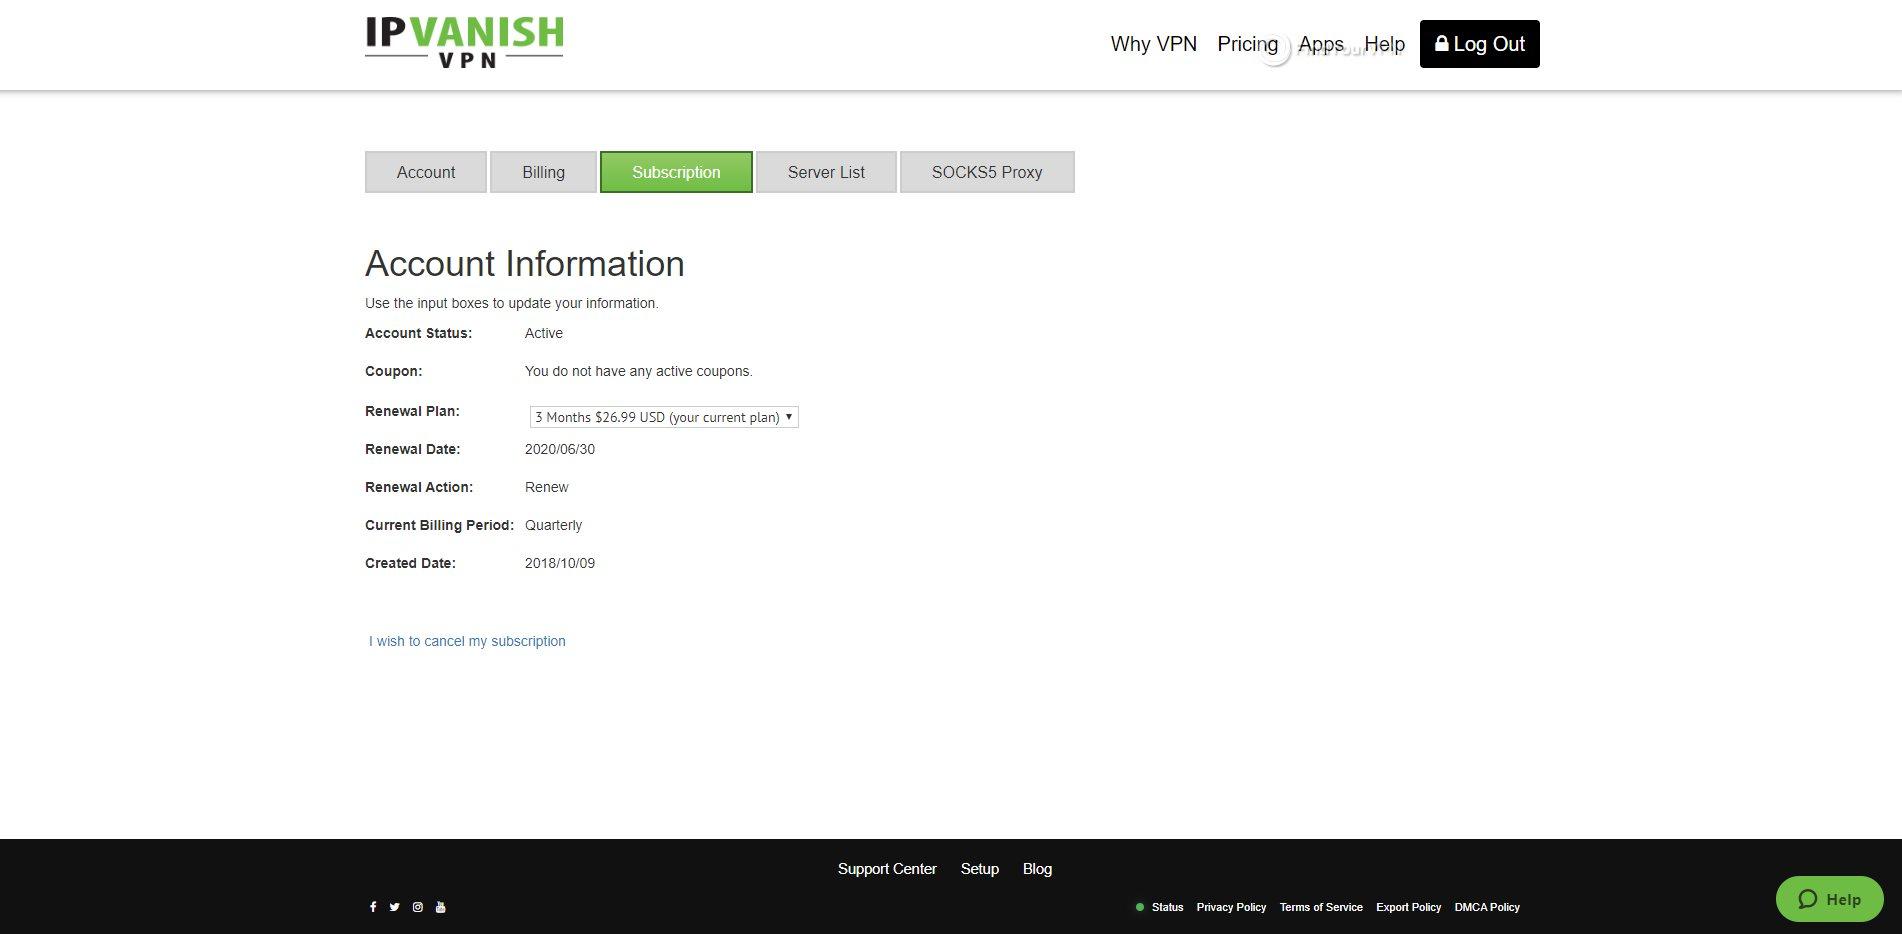 IPVanish Dashboard Subscription Details